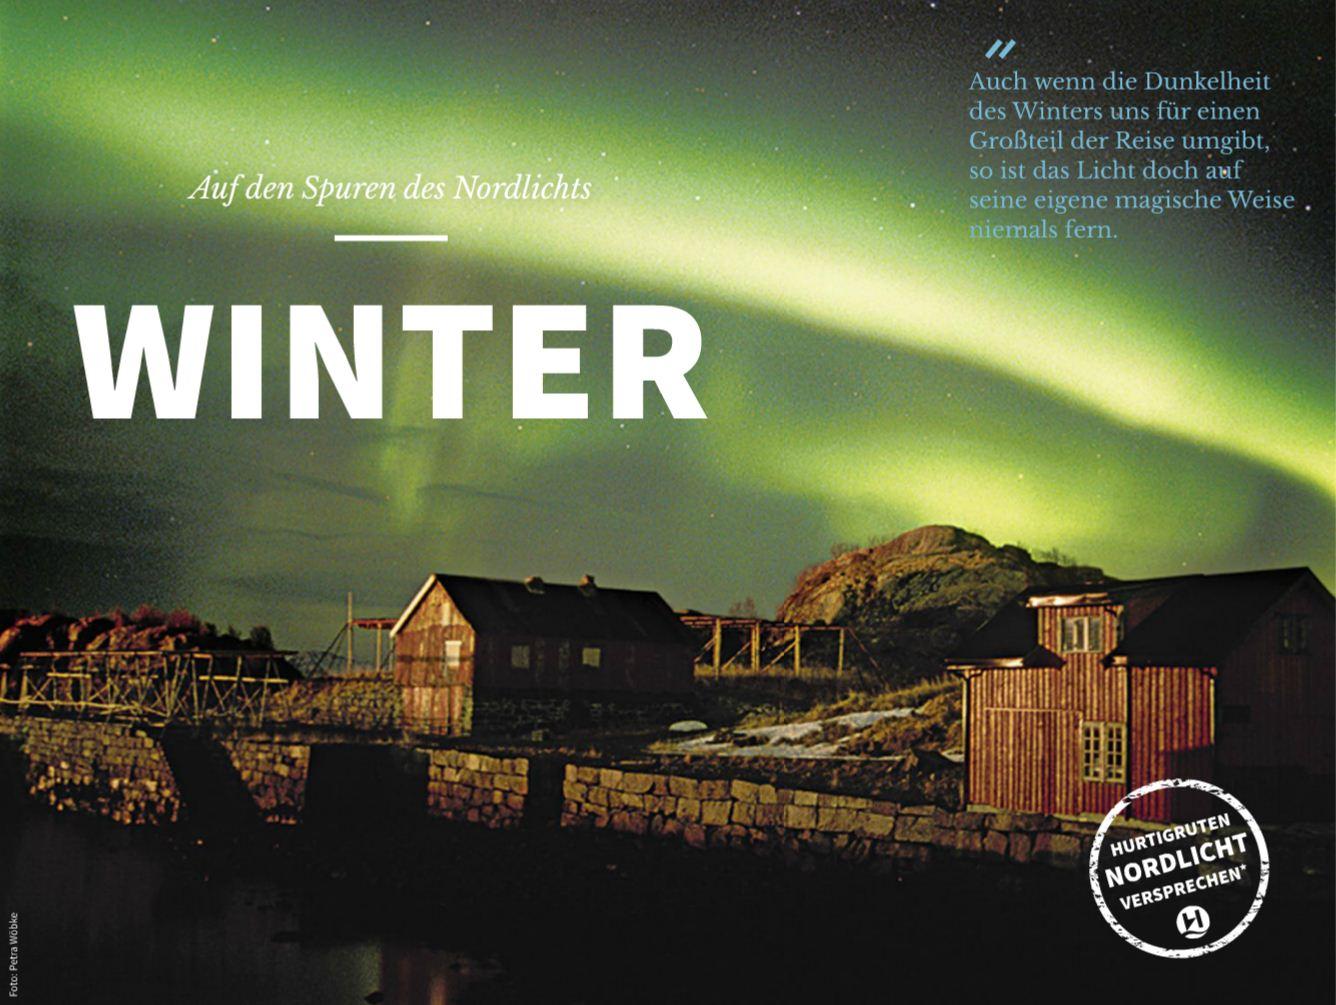 Hurtigruten Norwegen Winter Jensenreisen Spezialist